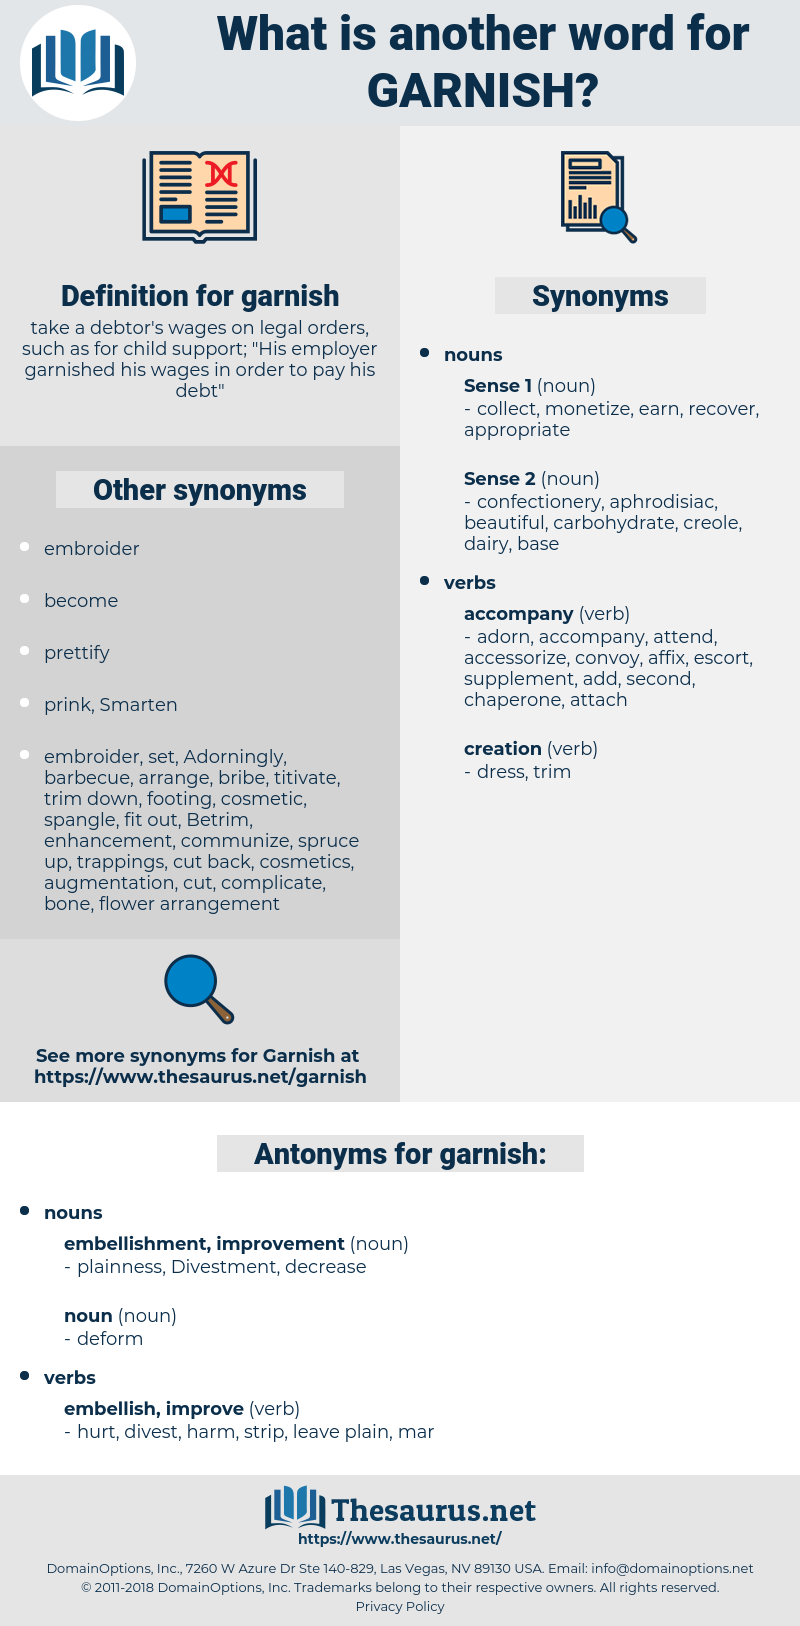 garnish, synonym garnish, another word for garnish, words like garnish, thesaurus garnish